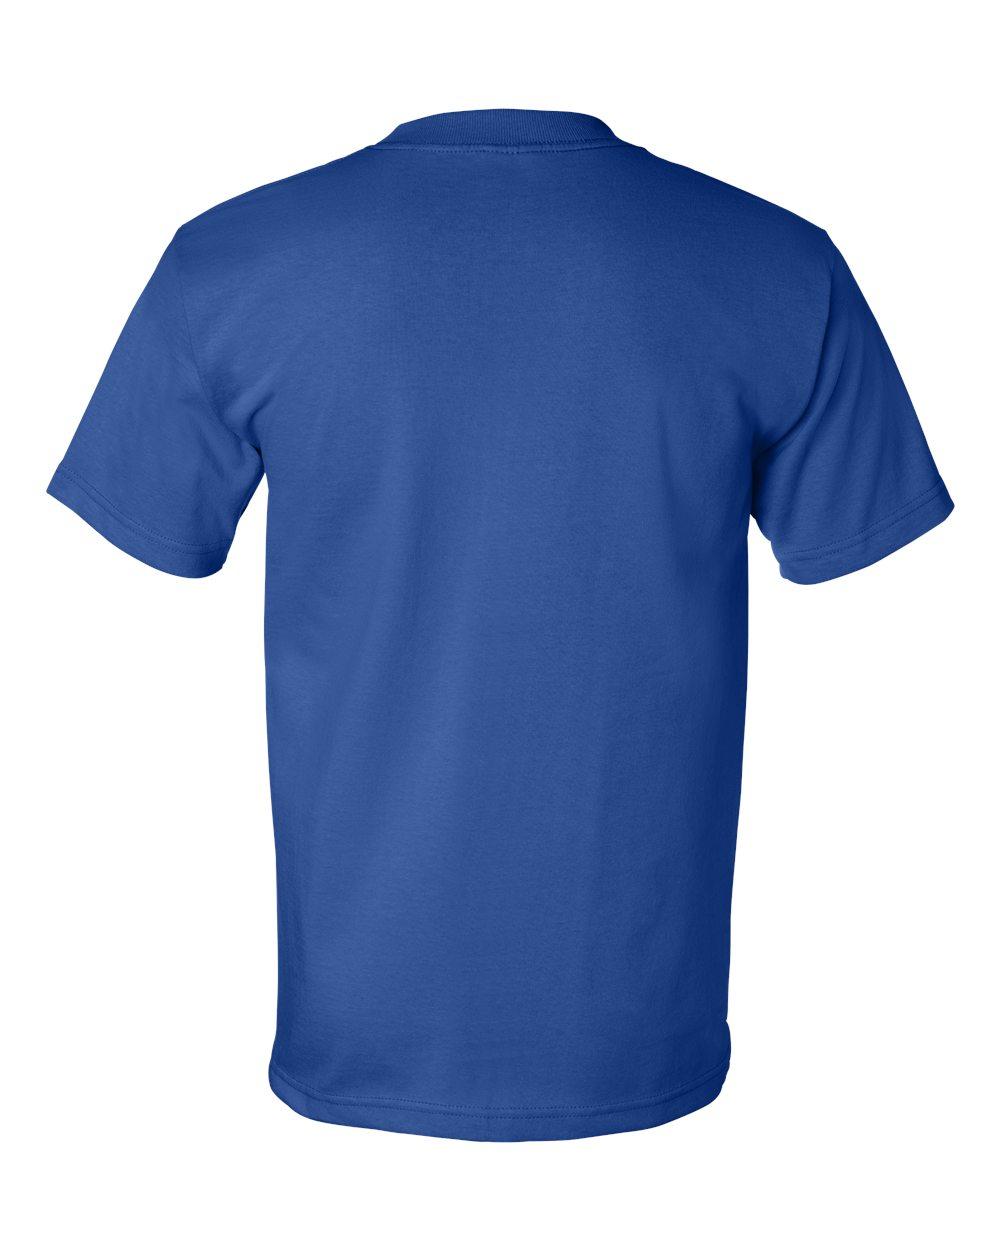 Bayside-Mens-Cotton-Blank-USA-Made-Short-Sleeve-T-Shirt-5100-up-to-5XL thumbnail 37